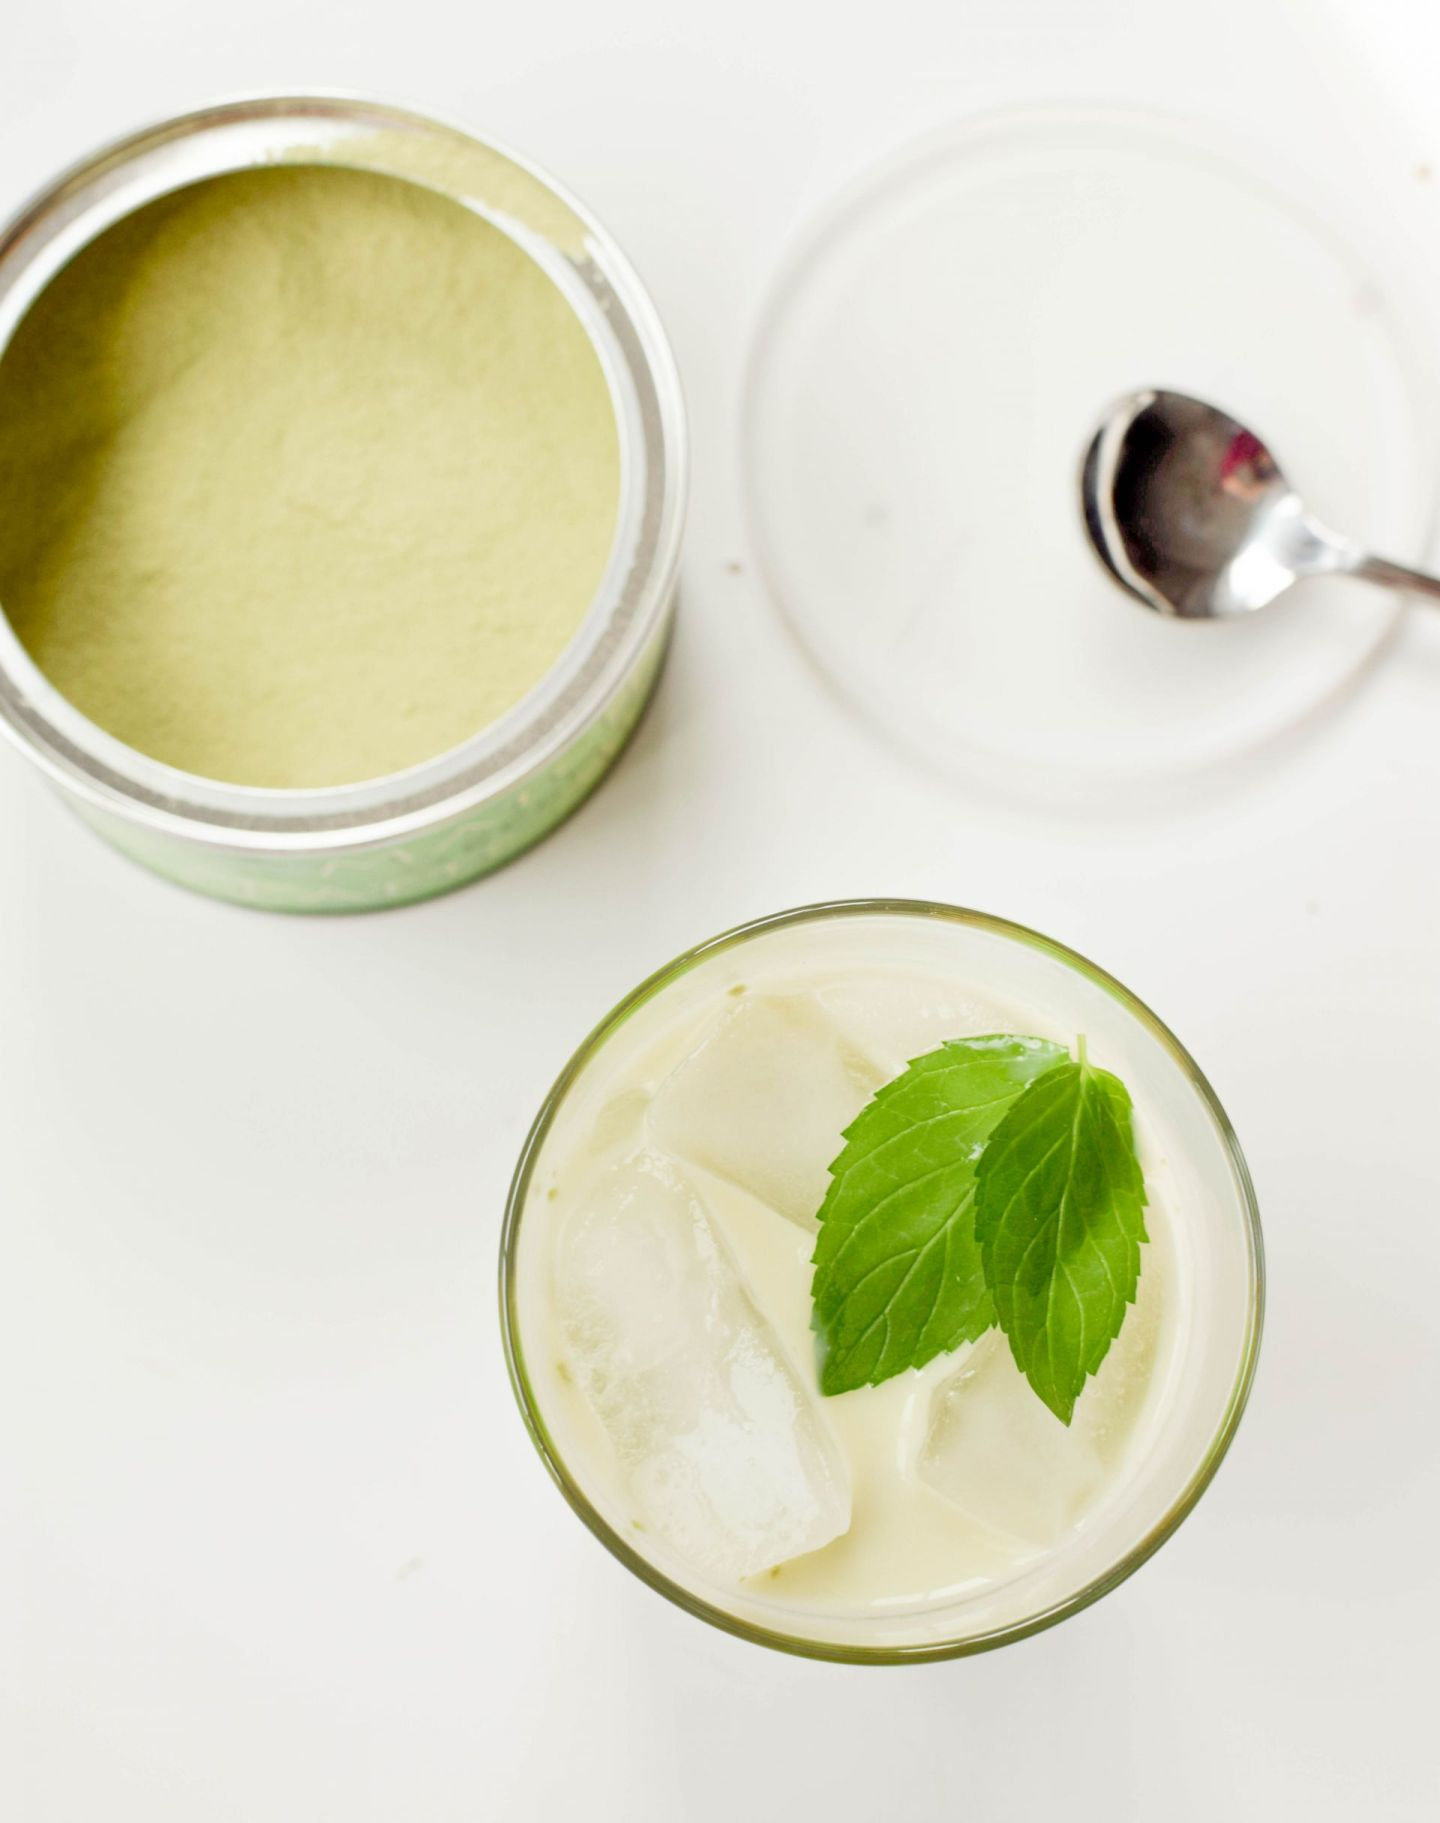 iced mint matcha latte recipe - trader joe's matcha green tea latte mix